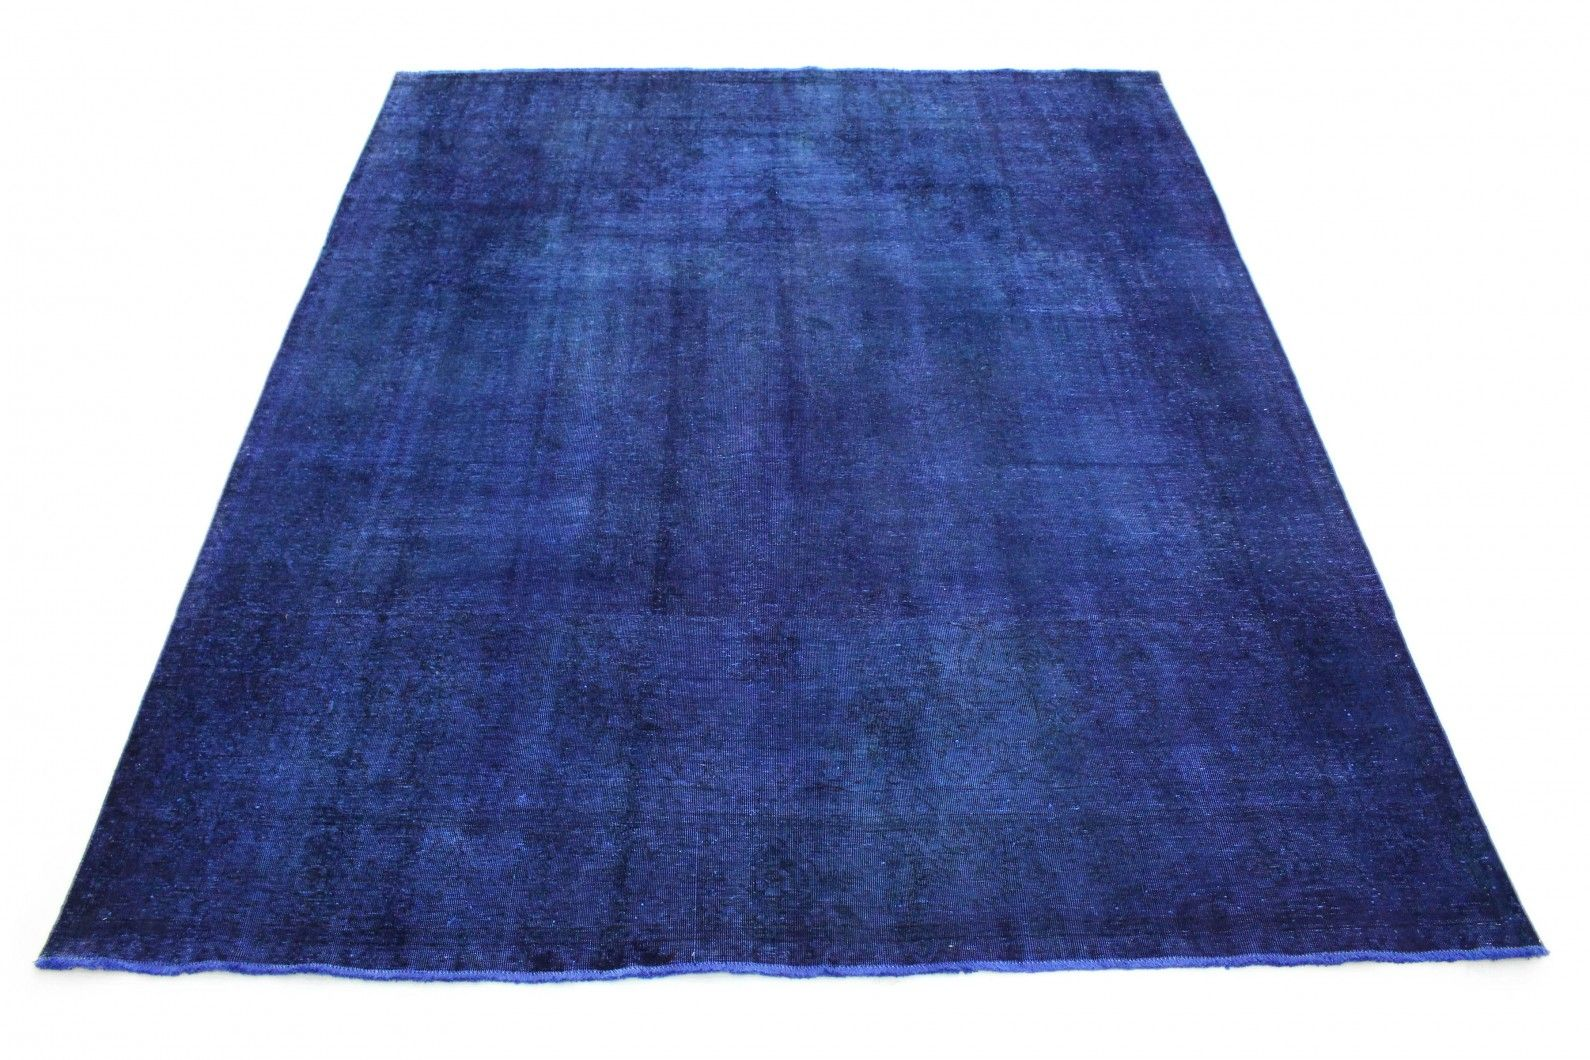 Vintage Teppich Lila Blau In 350x300 Lila Teppich Vintage Teppiche Teppich Design